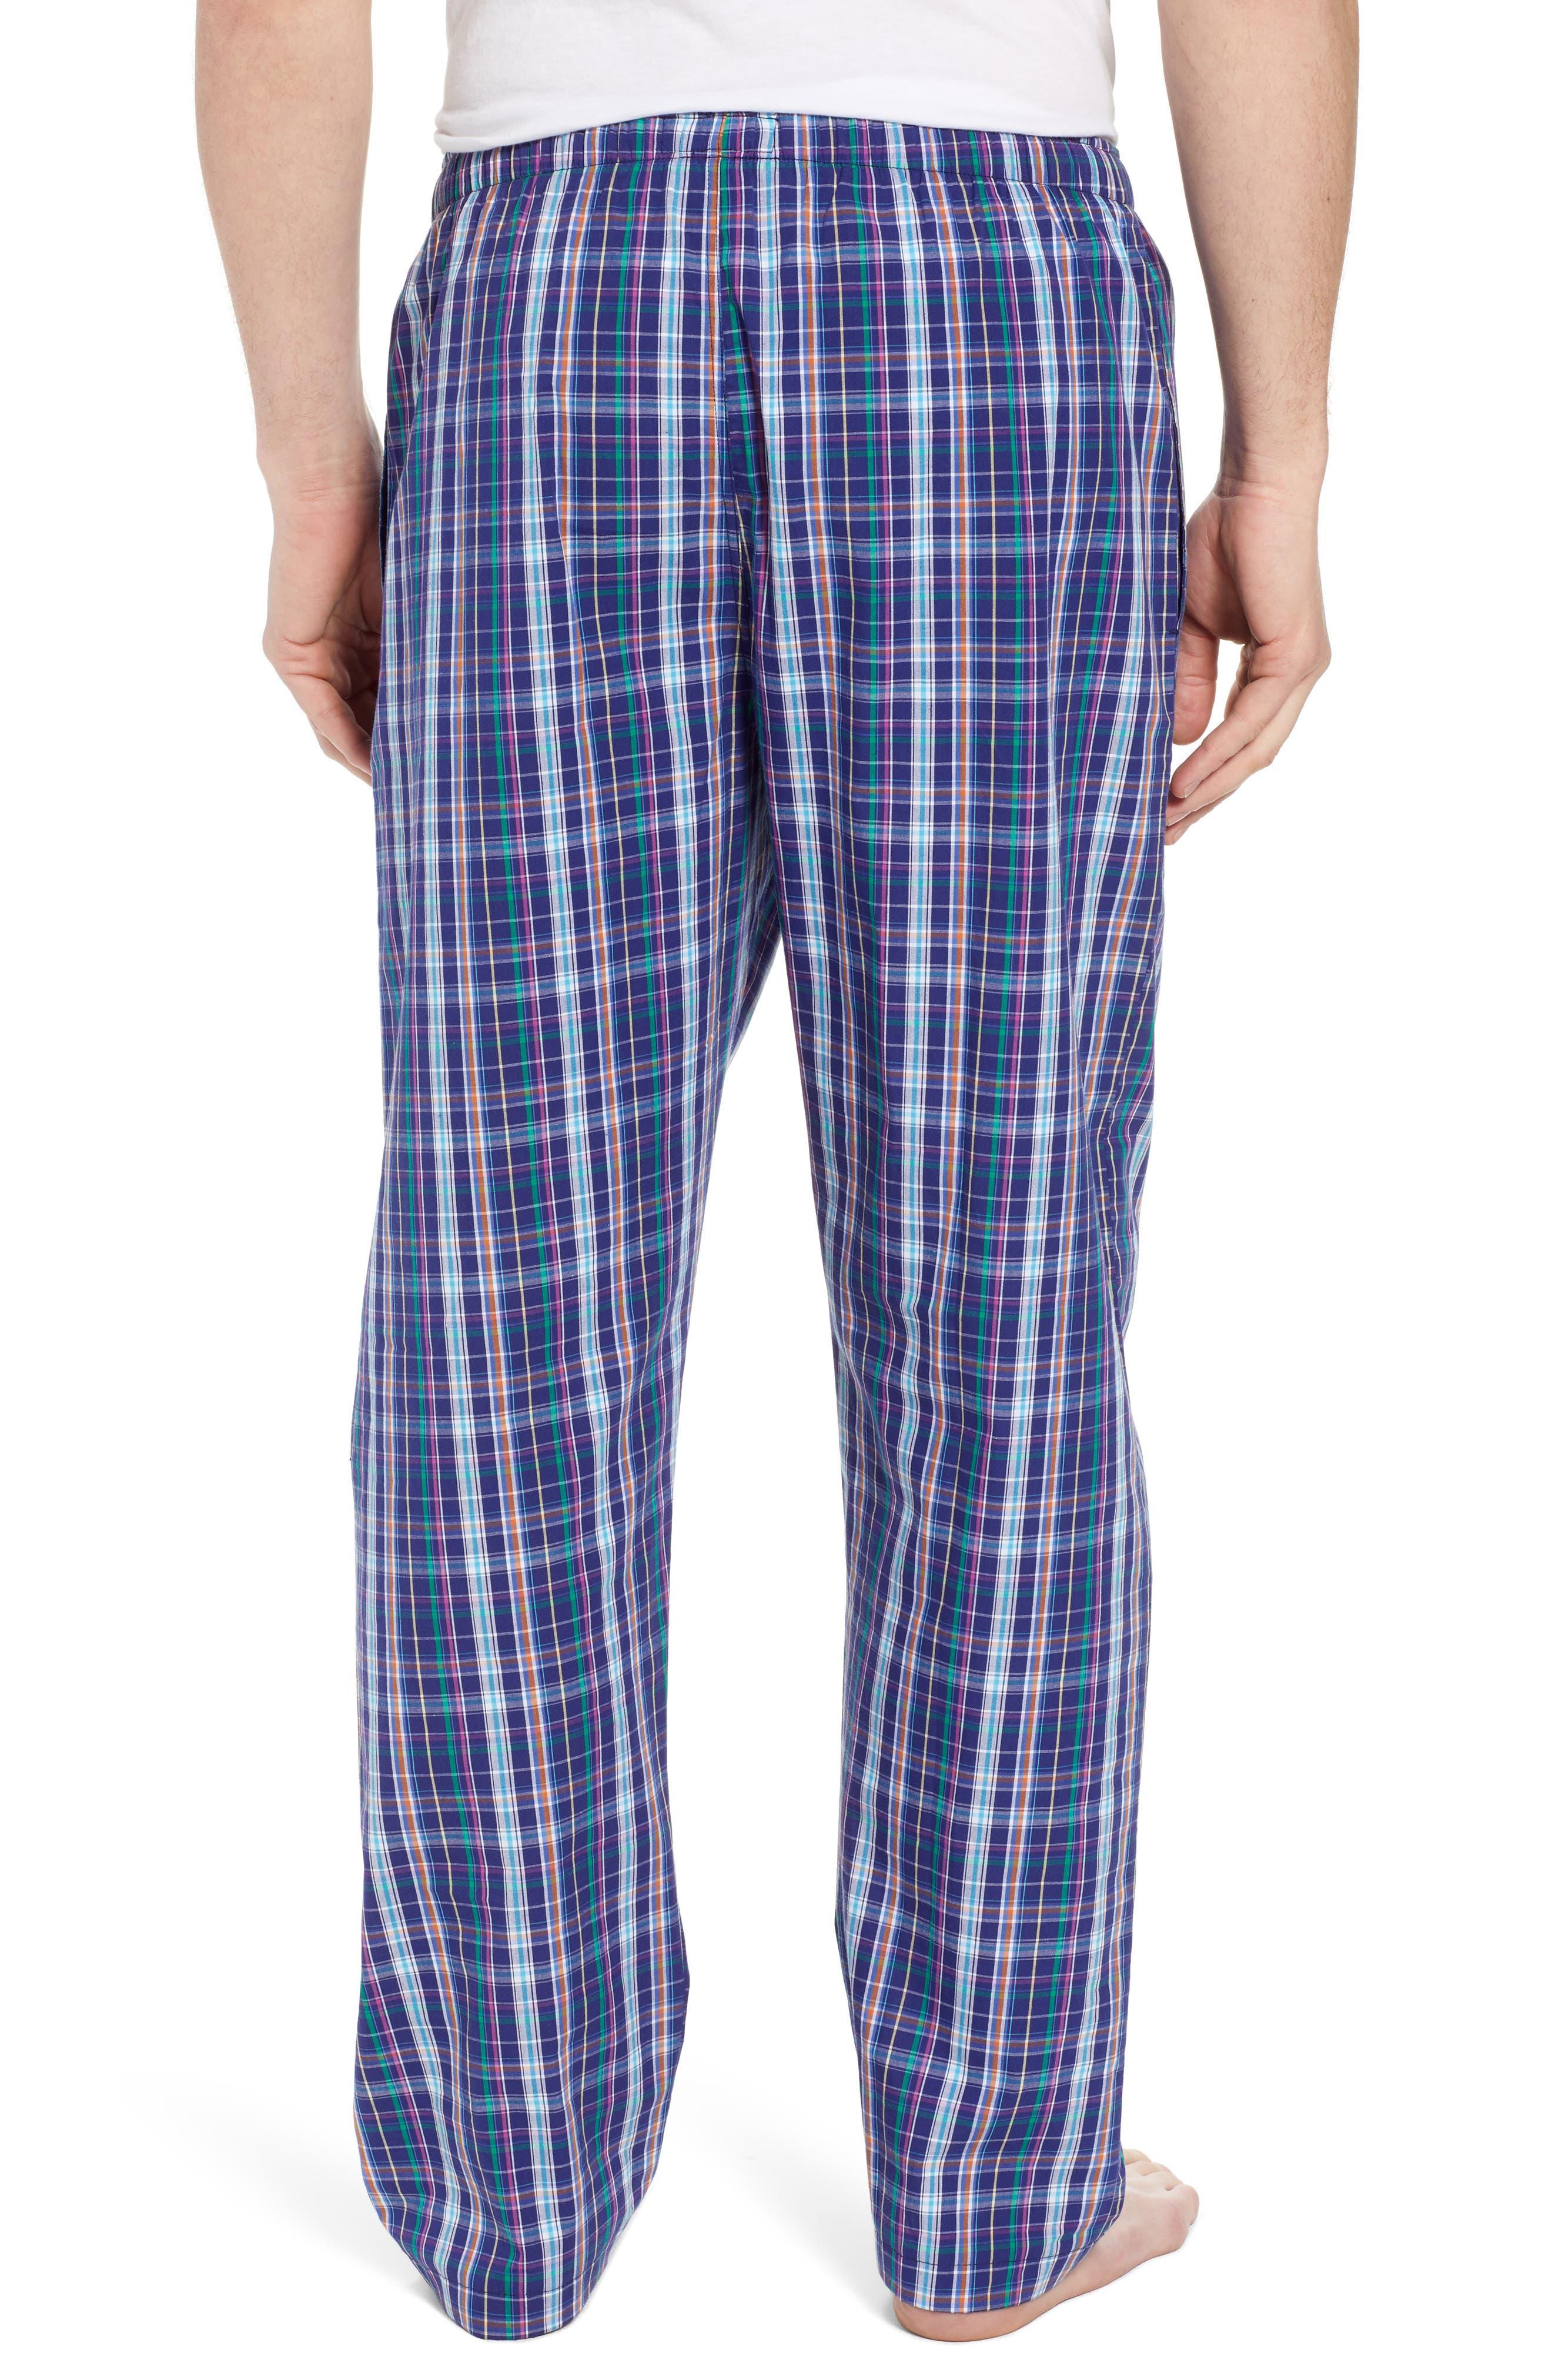 Cotton Lounge Pants,                             Alternate thumbnail 2, color,                             Alton Plaid/ May Orange